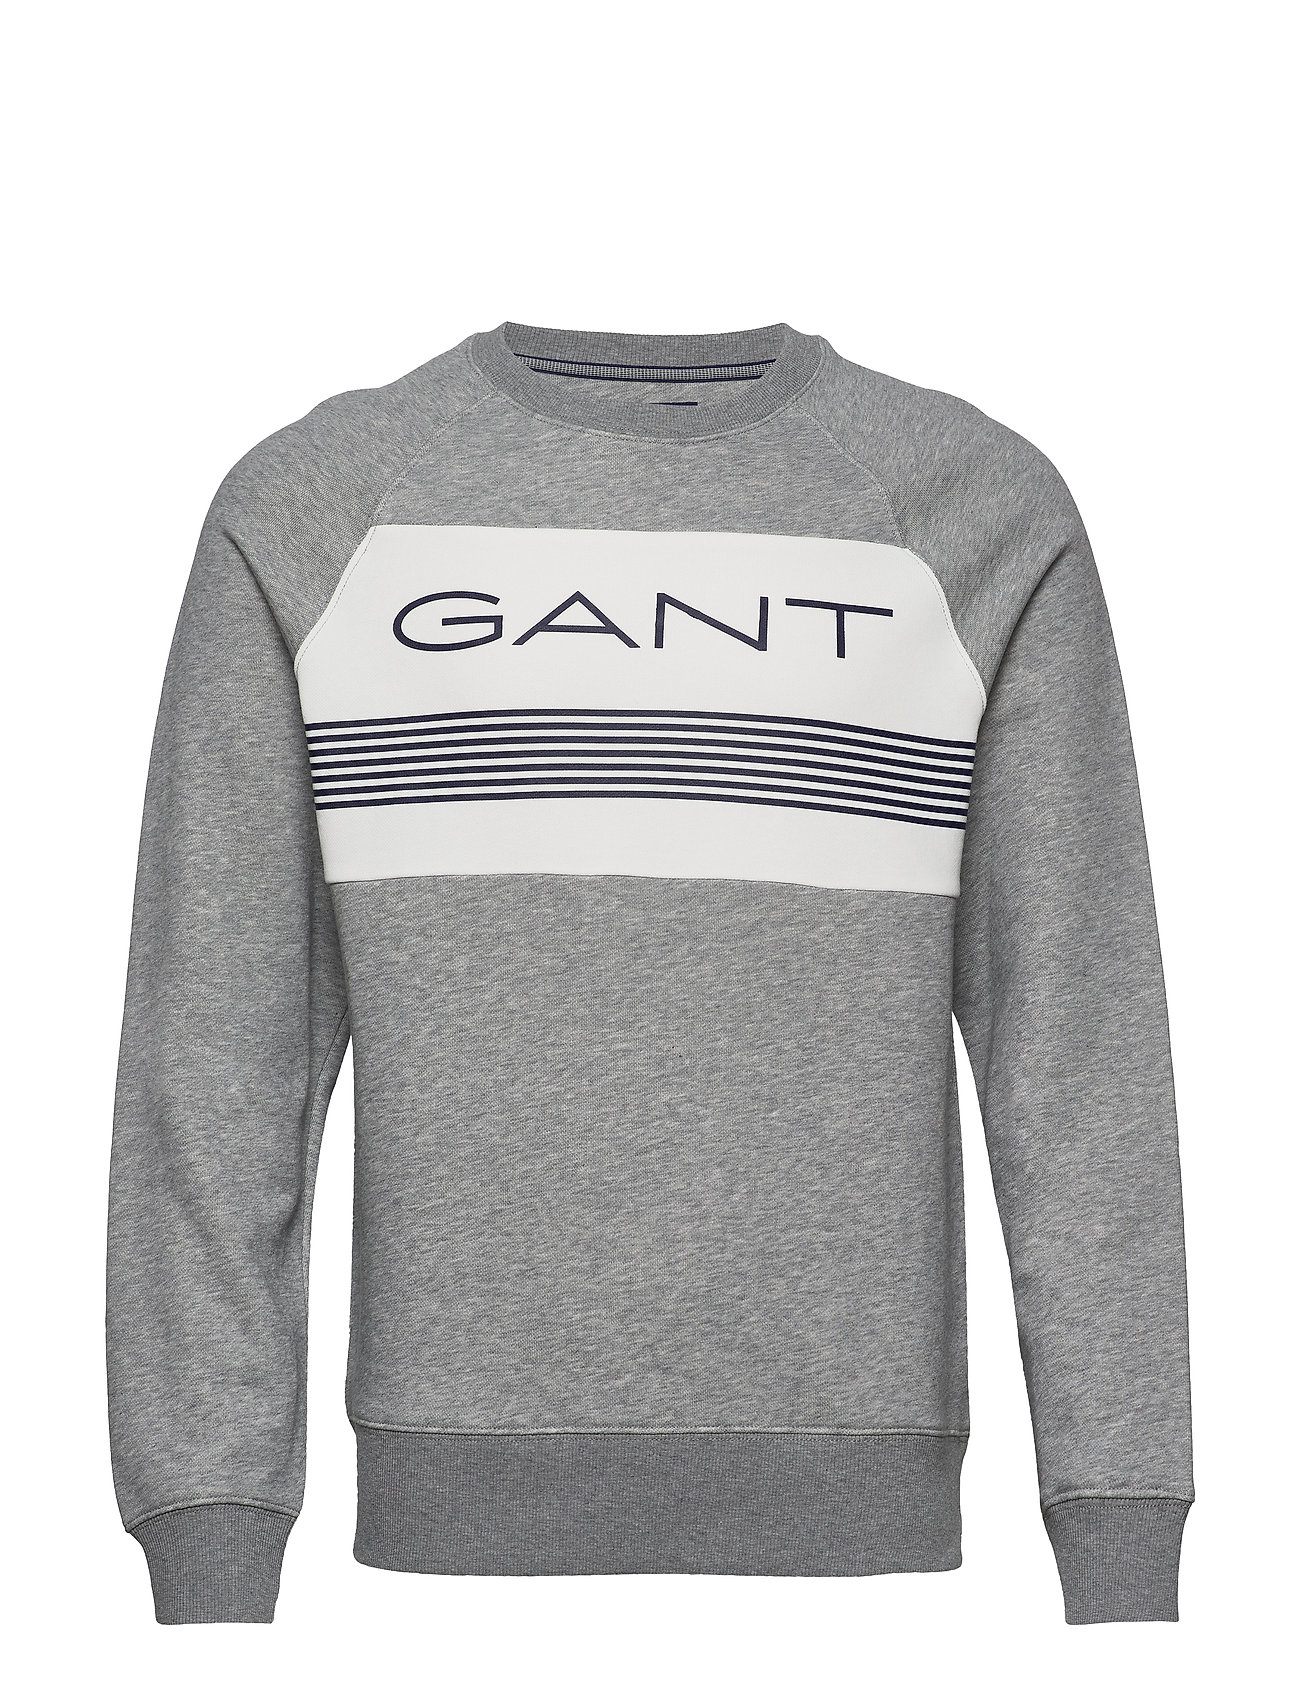 Gant D1. GANT STRIPE C-NECK SWEAT - GREY MELANGE